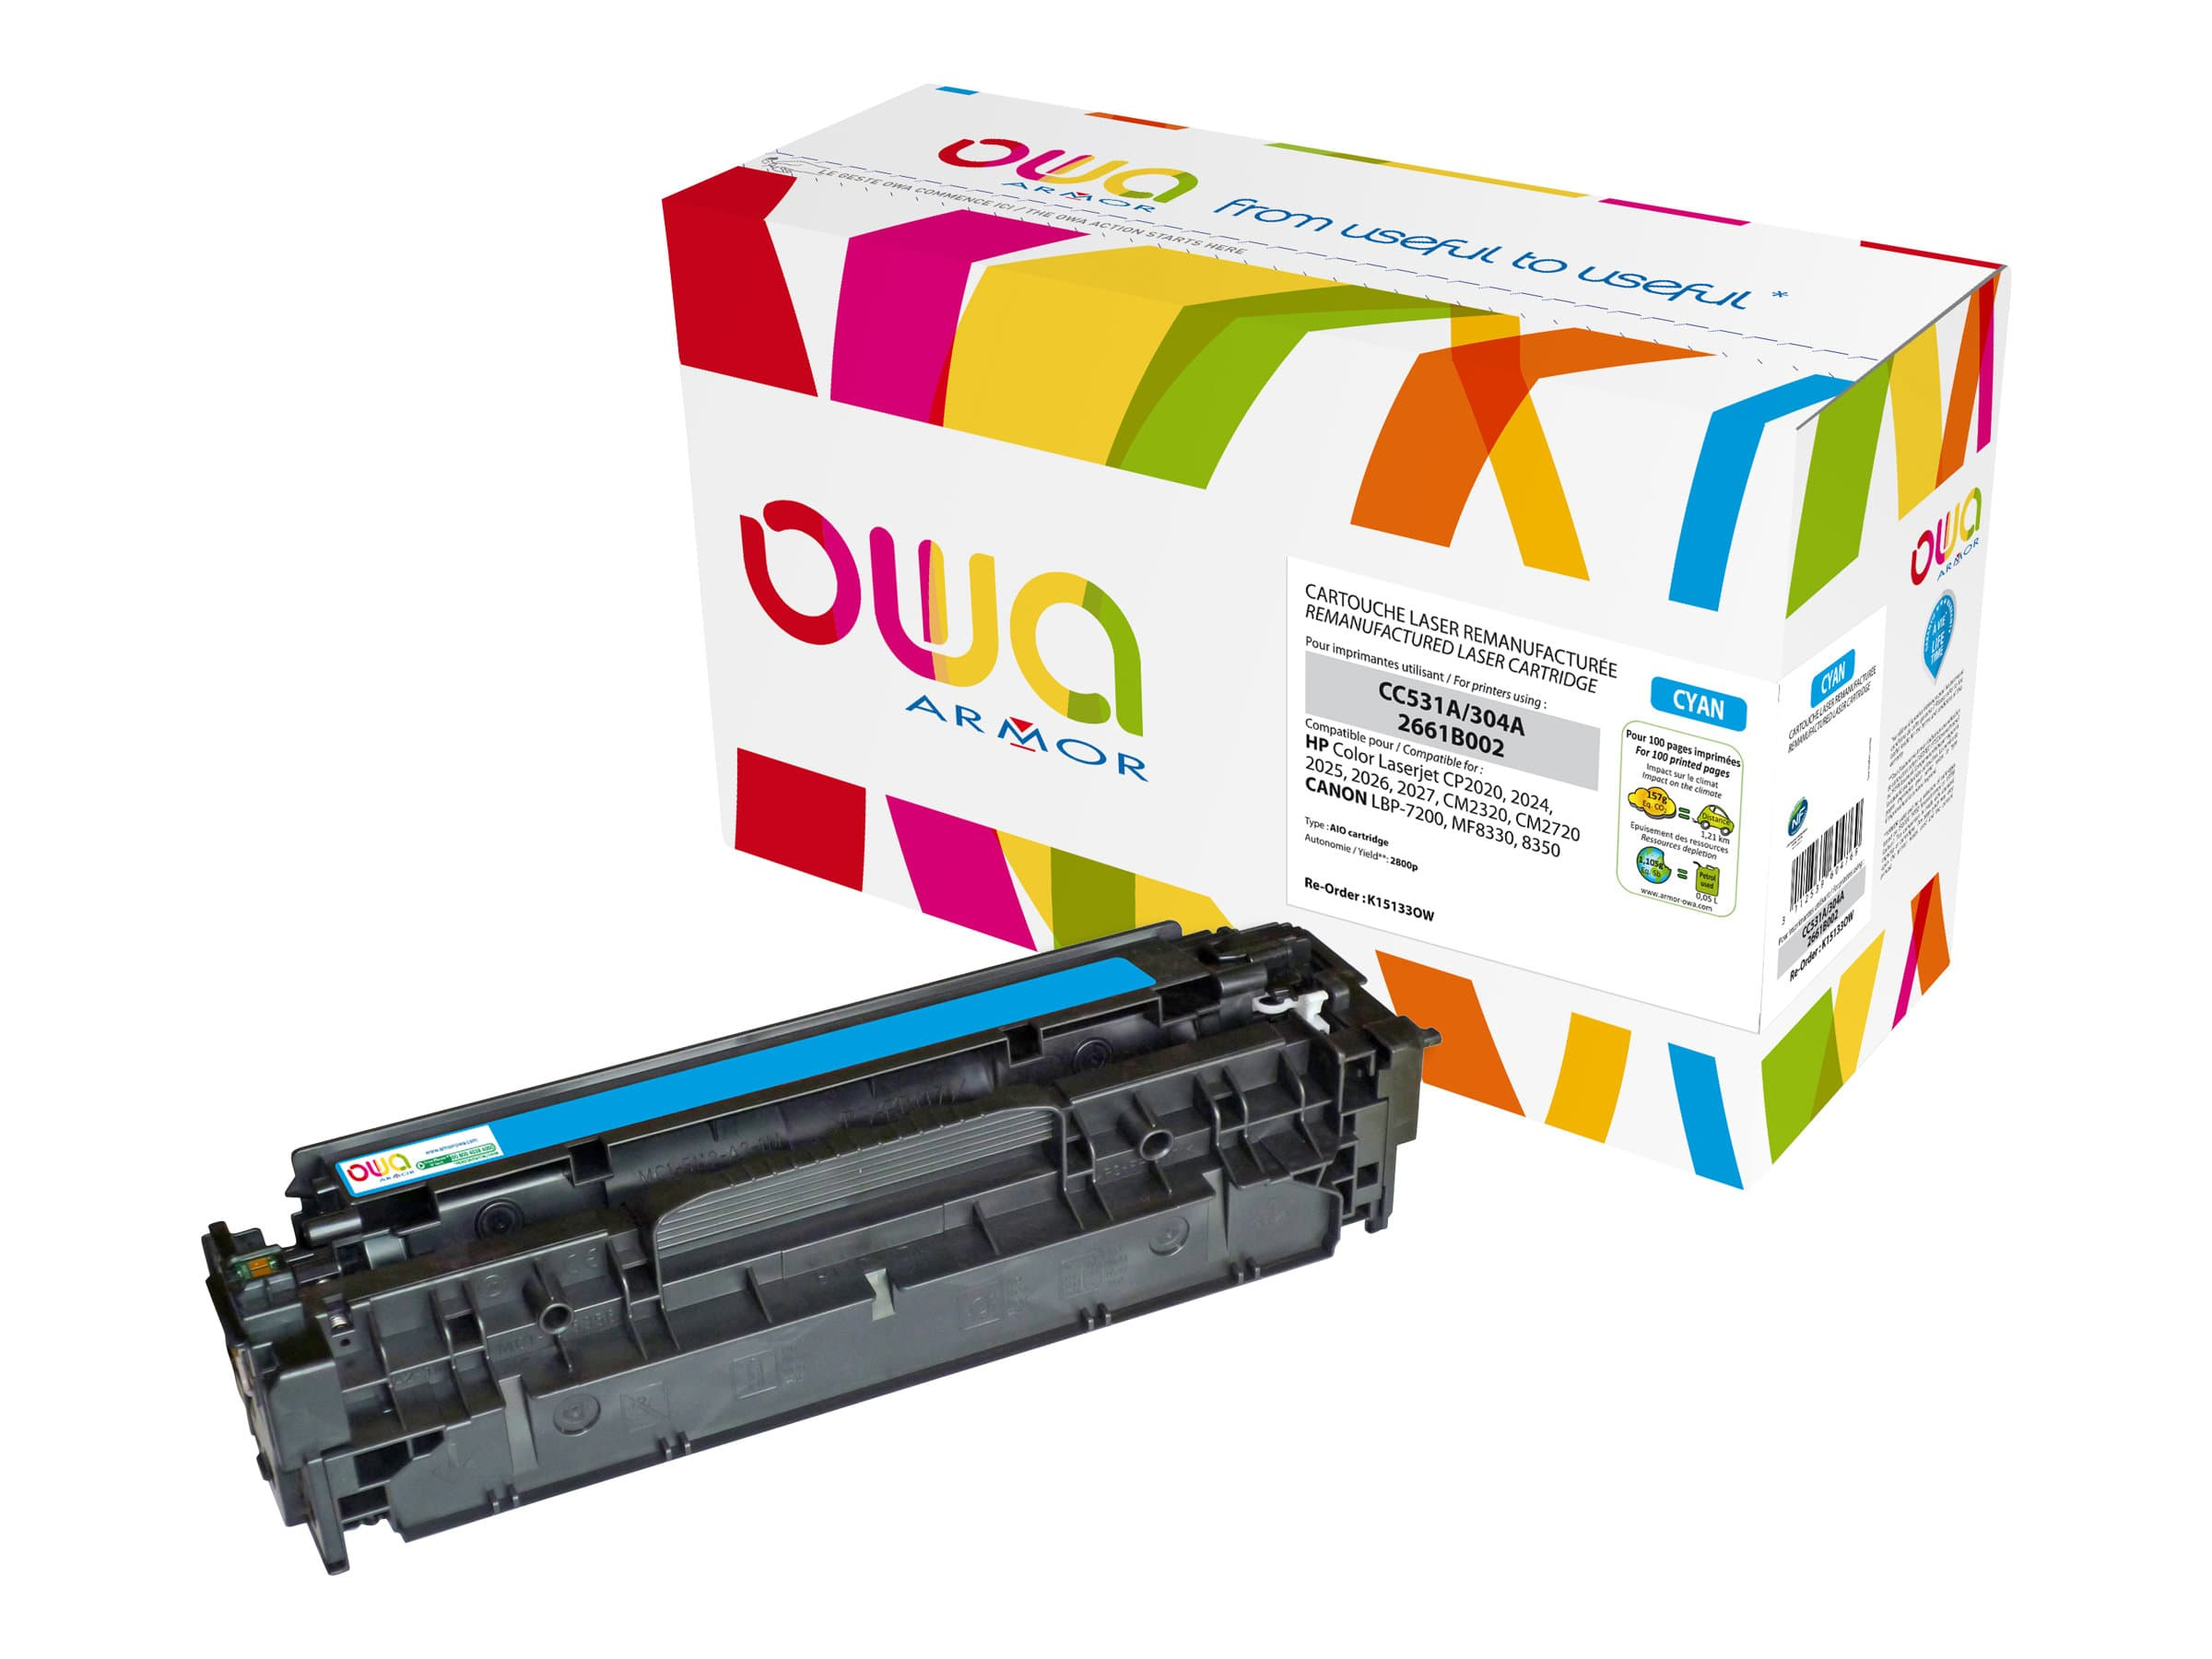 HP 304A - remanufacturé Owa K15133OW - cyan - cartouche laser